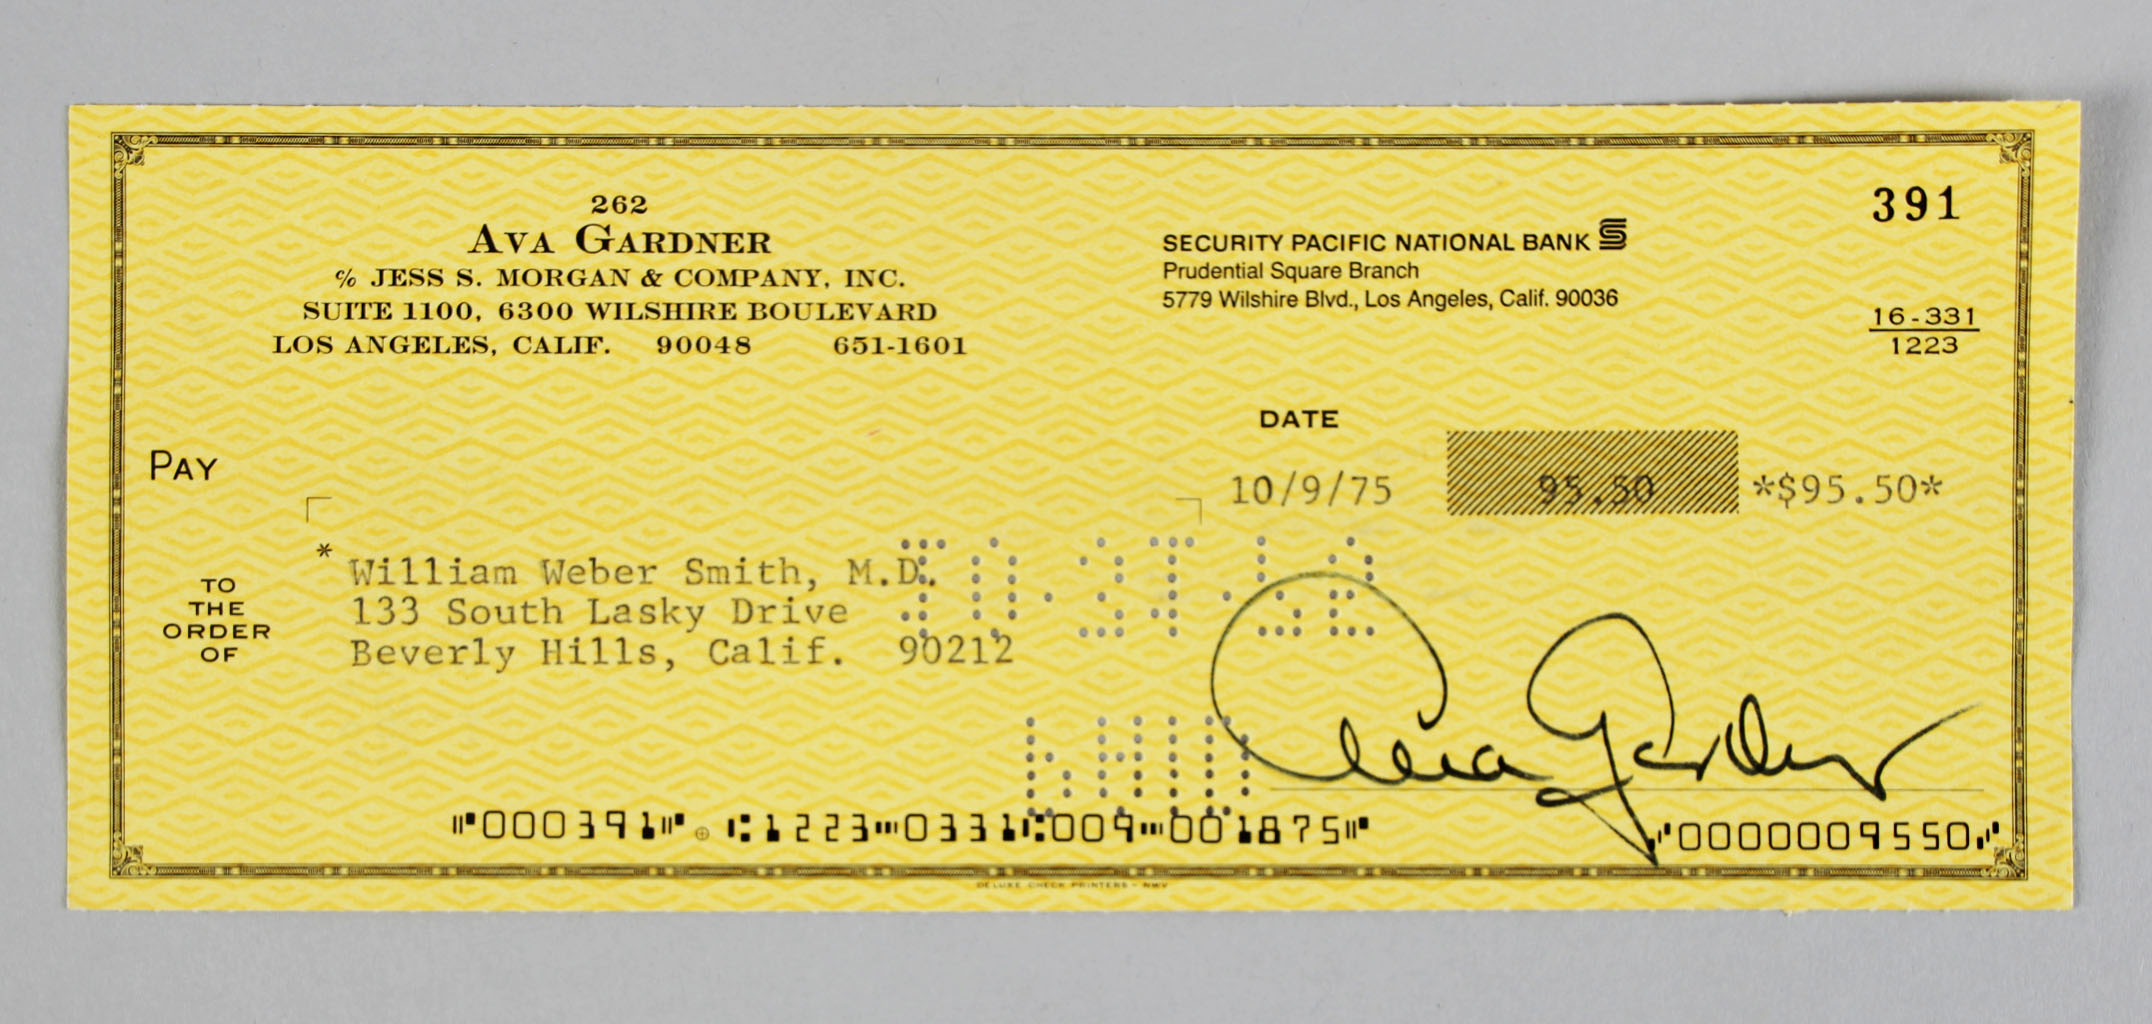 Ava Gardner Signed Personal Check - COA